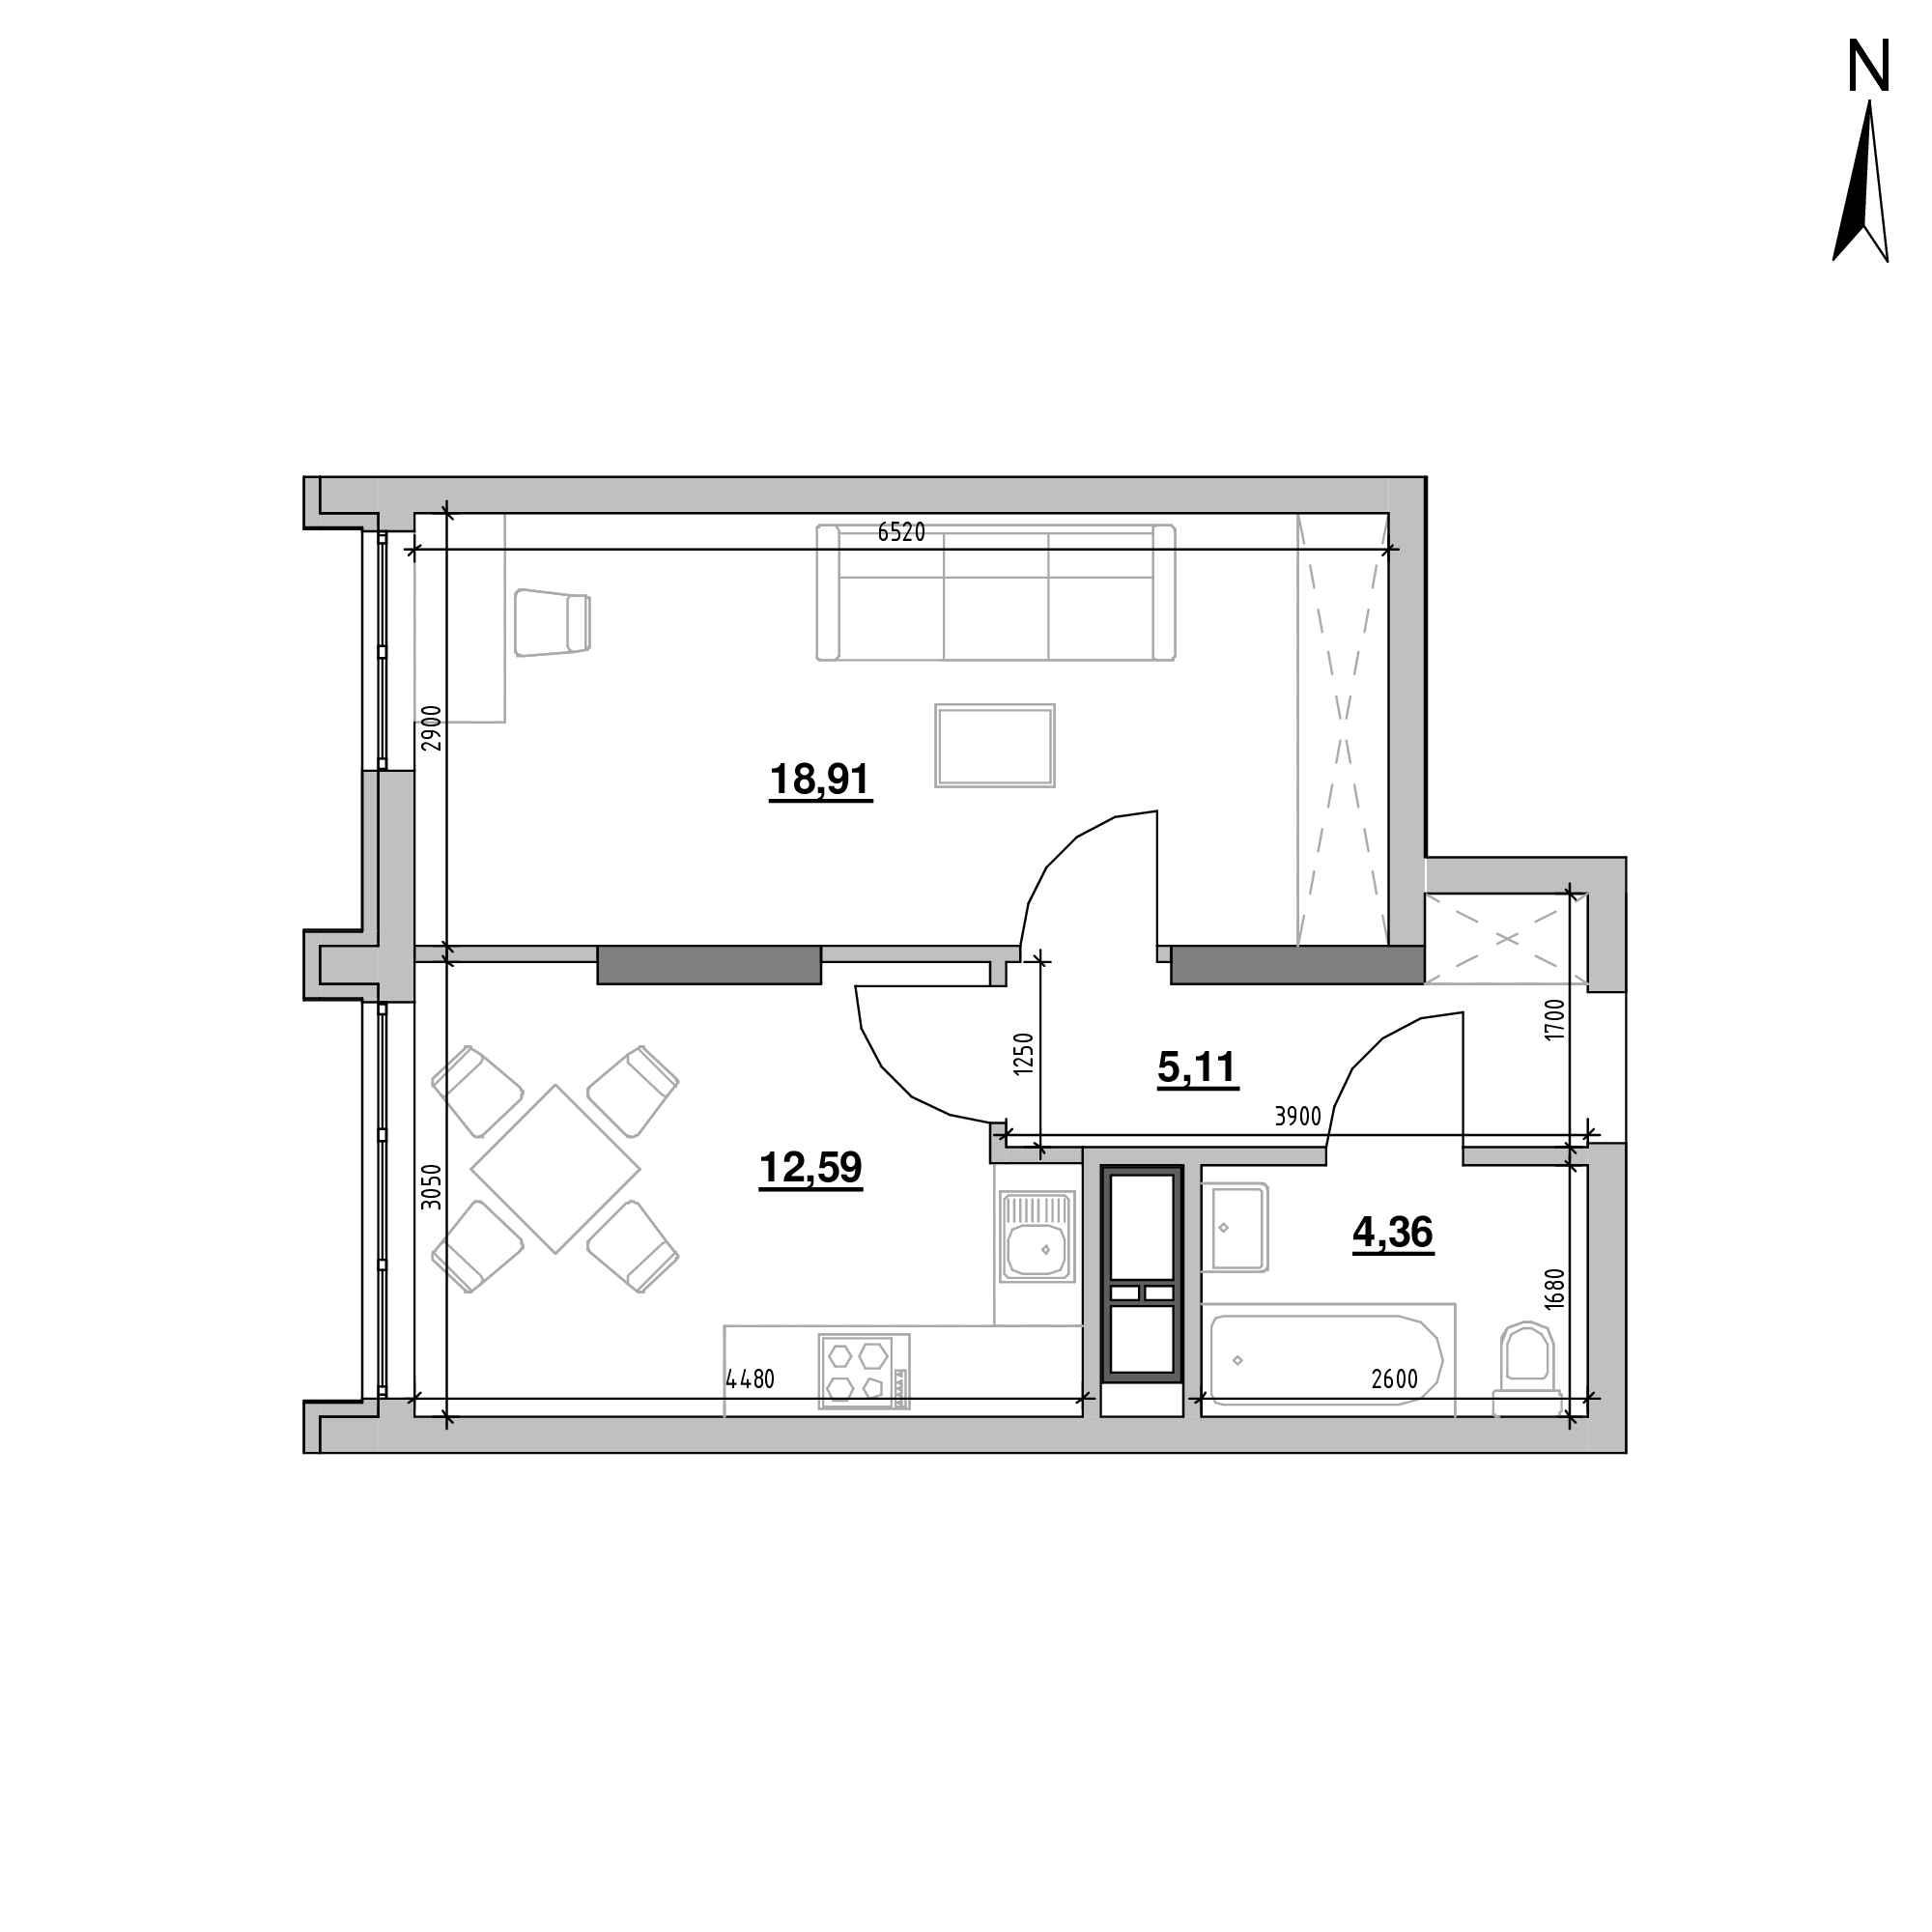 ЖК Nordica Residence: планування 1-кімнатної квартири, №16, 40.97 м<sup>2</sup>